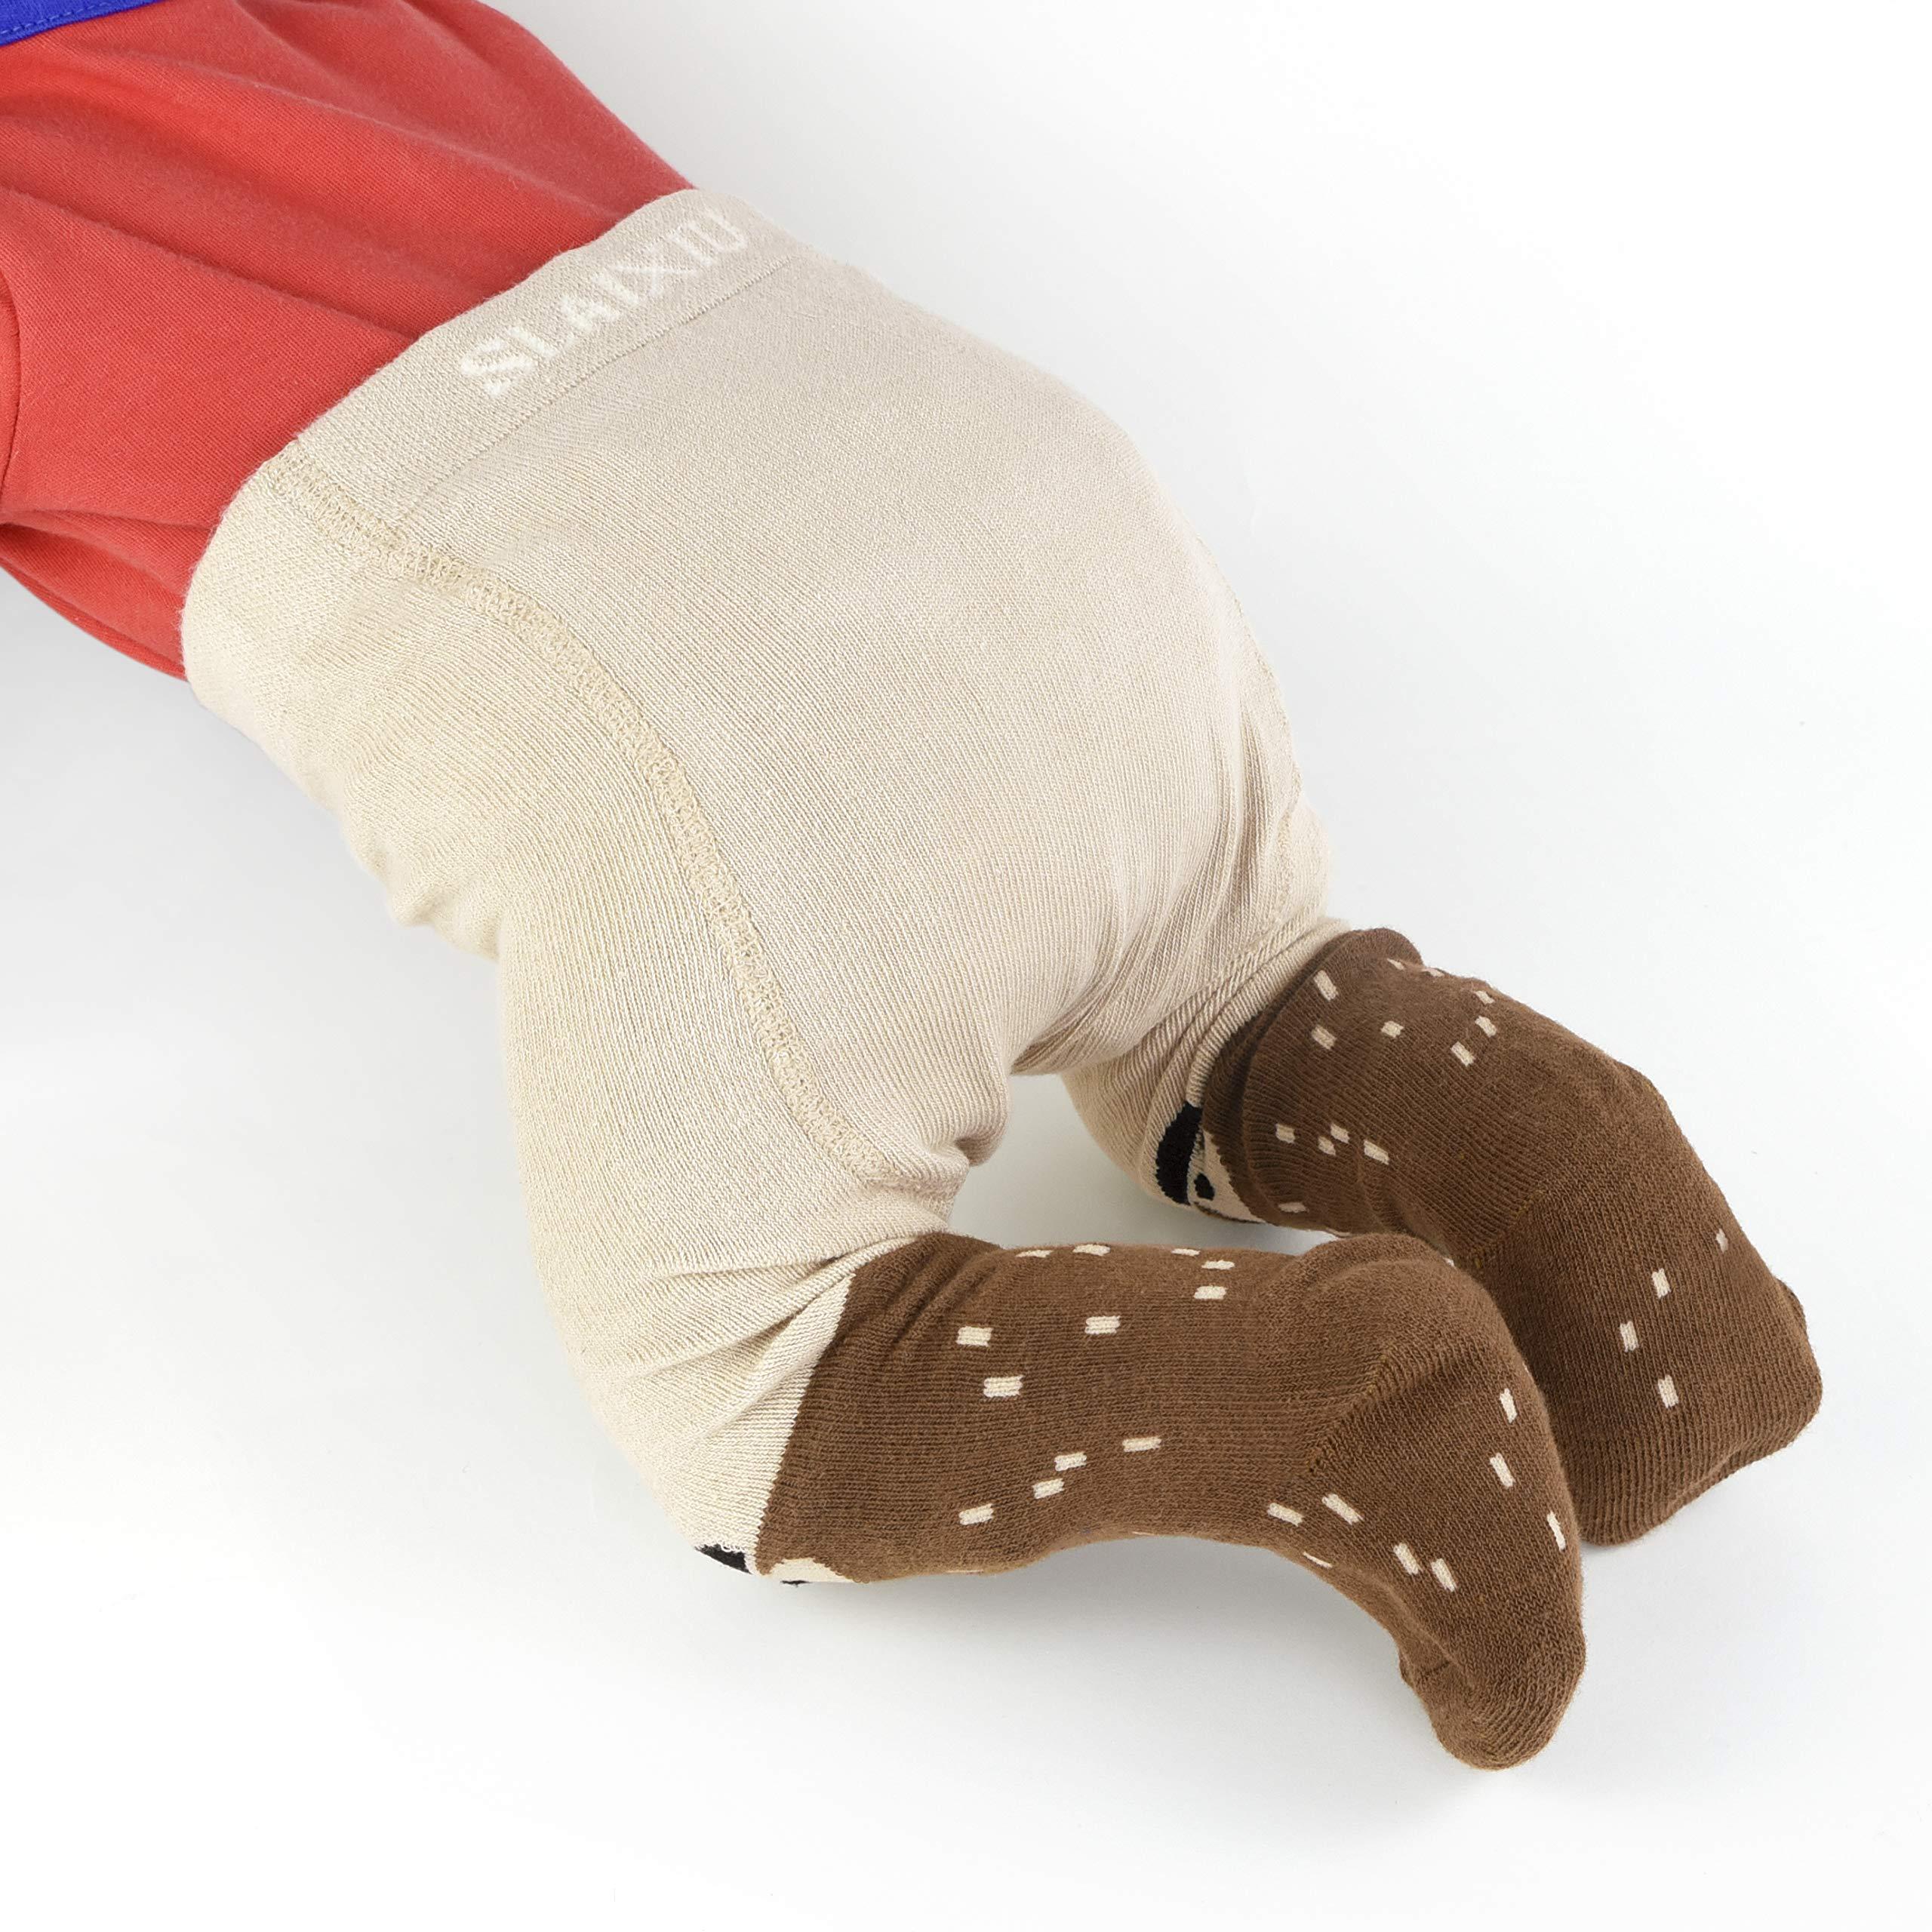 slaixiu Cotton Baby Girl Tights Cable Knit Seamless Toddler Leggings Pantyhose Pants Stockings 3-Pack(Tree&Fox&BeigePanda_0-6 M)